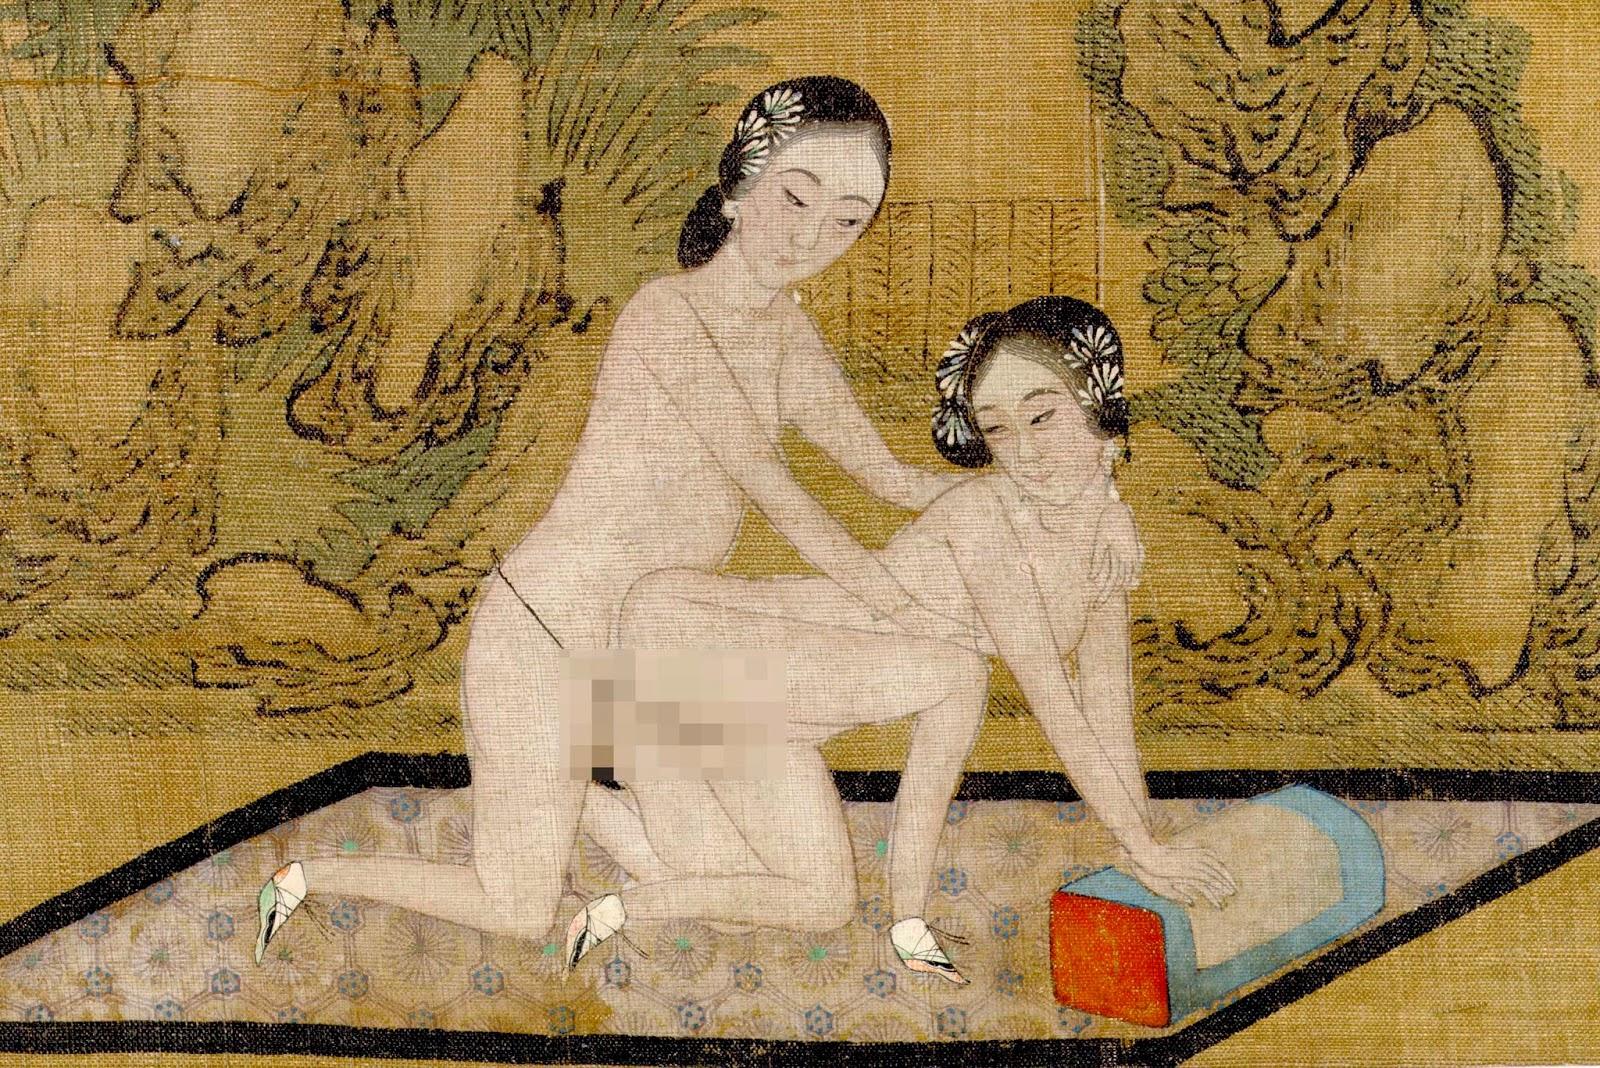 Male homosexuality in western art